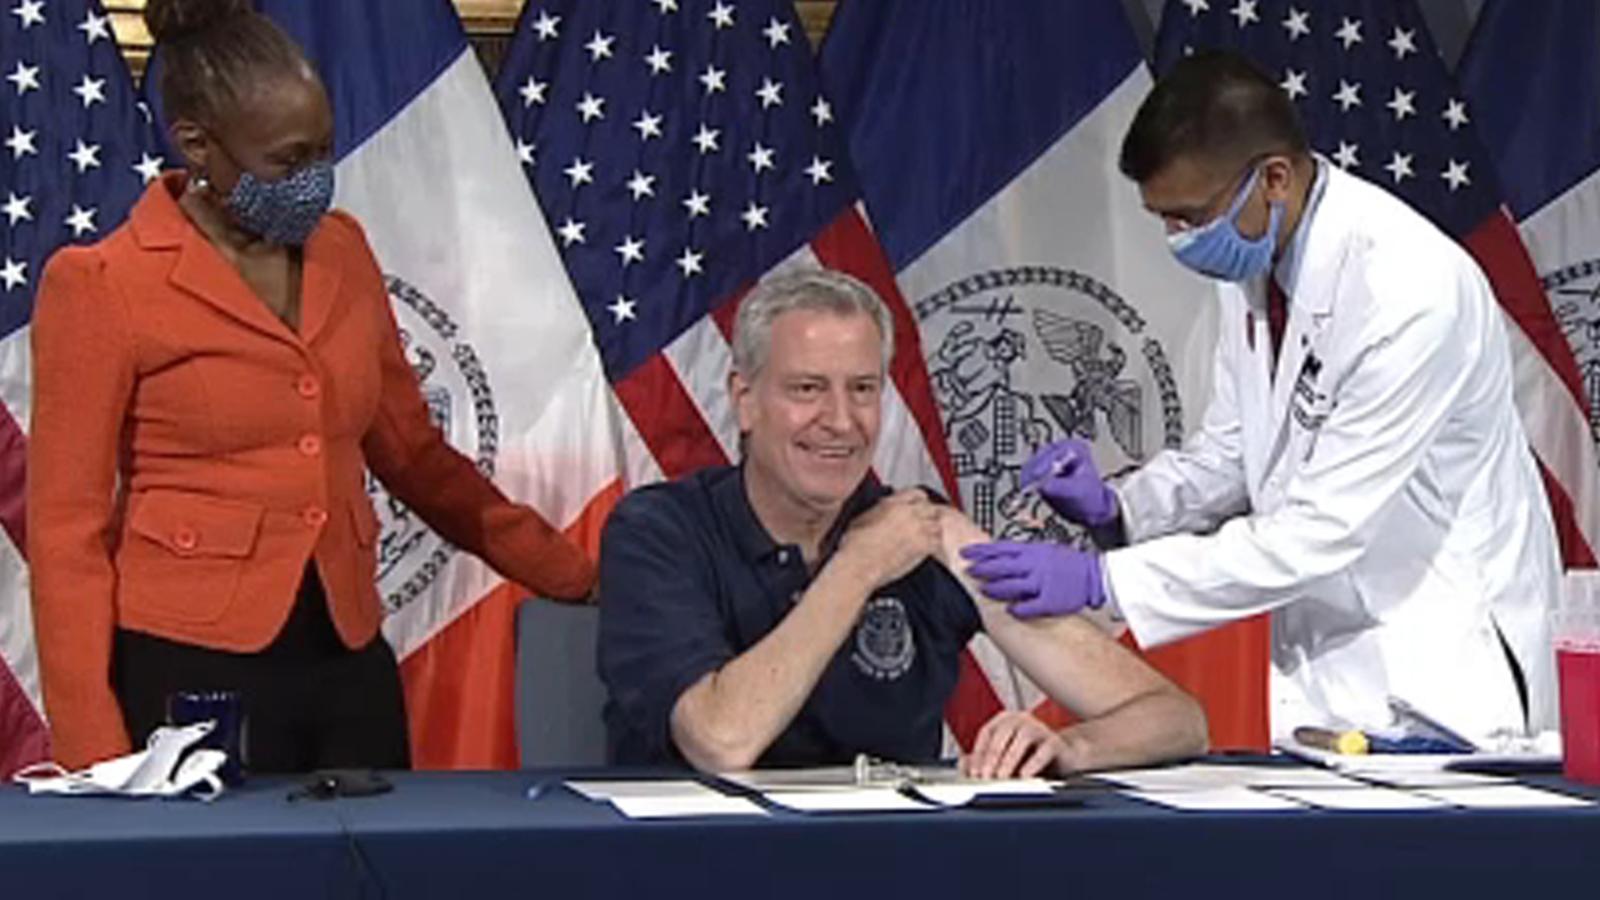 10429119 031821 wabc mayor vaccinated img jpg?w=1600.